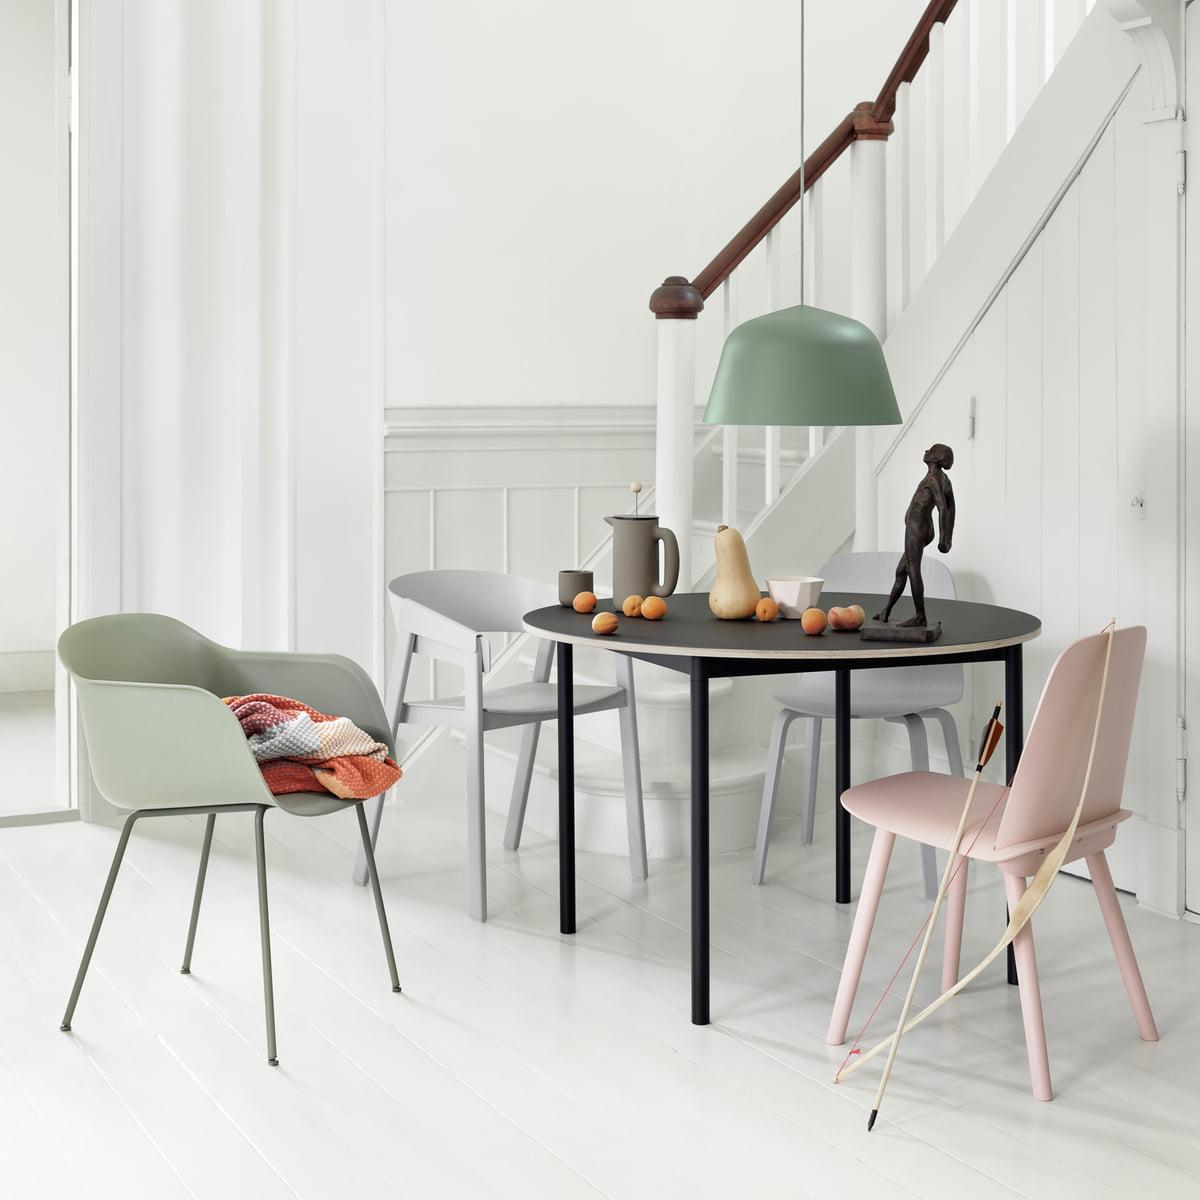 base table von muuto connox. Black Bedroom Furniture Sets. Home Design Ideas